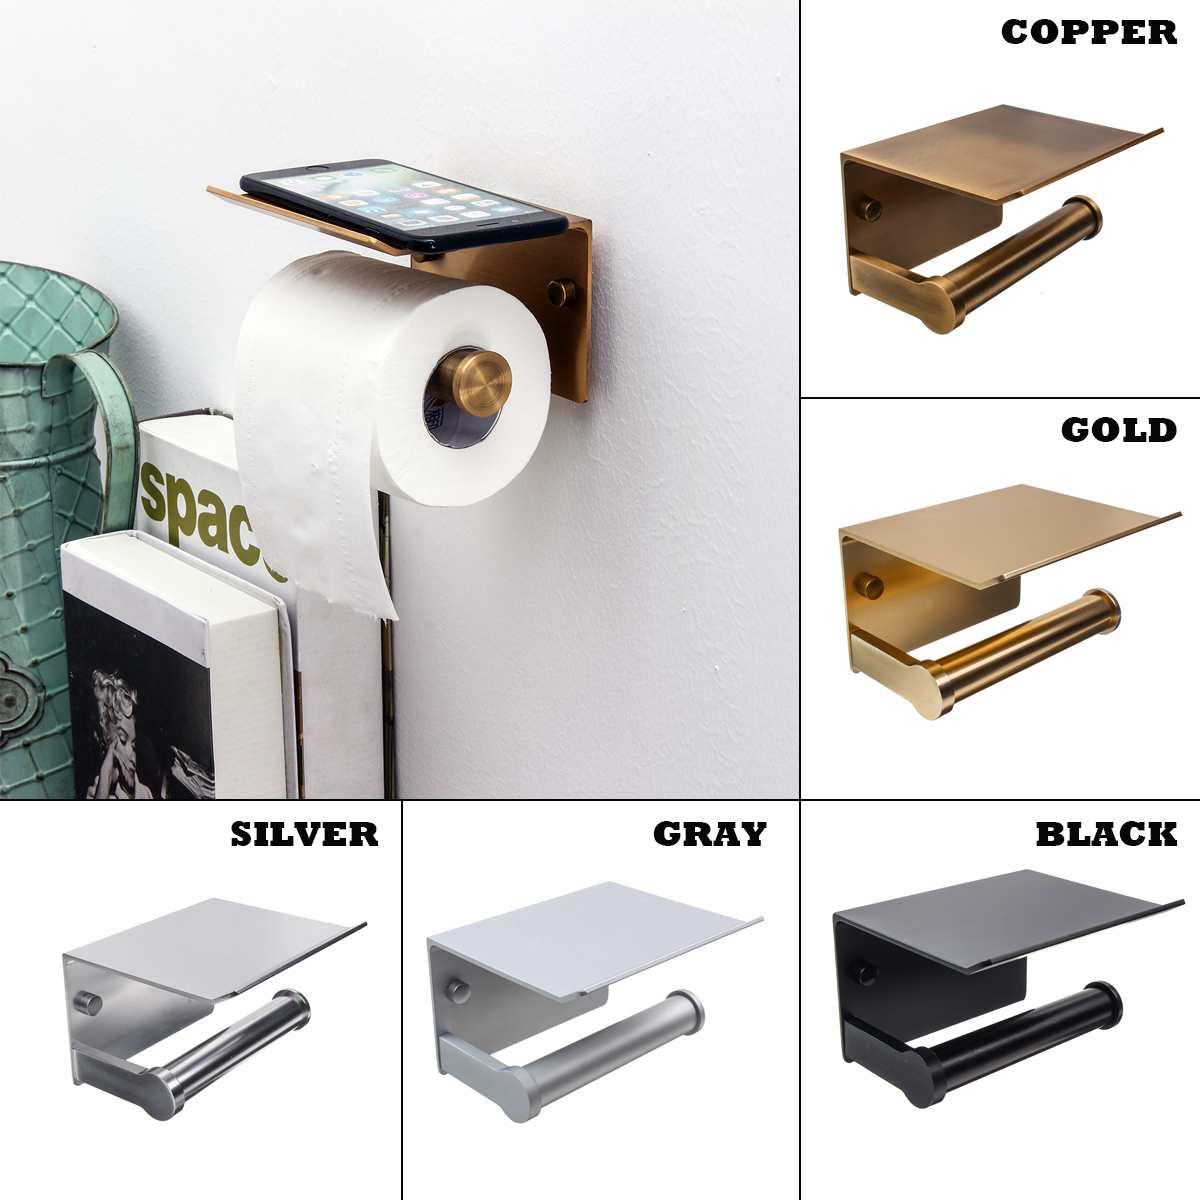 Bathroom Toilet Towel Paper Holder Phone Holder Wall Mount WC Rolhouder Paper Holder With Shelf Towel Rack Tissue Boxes Black